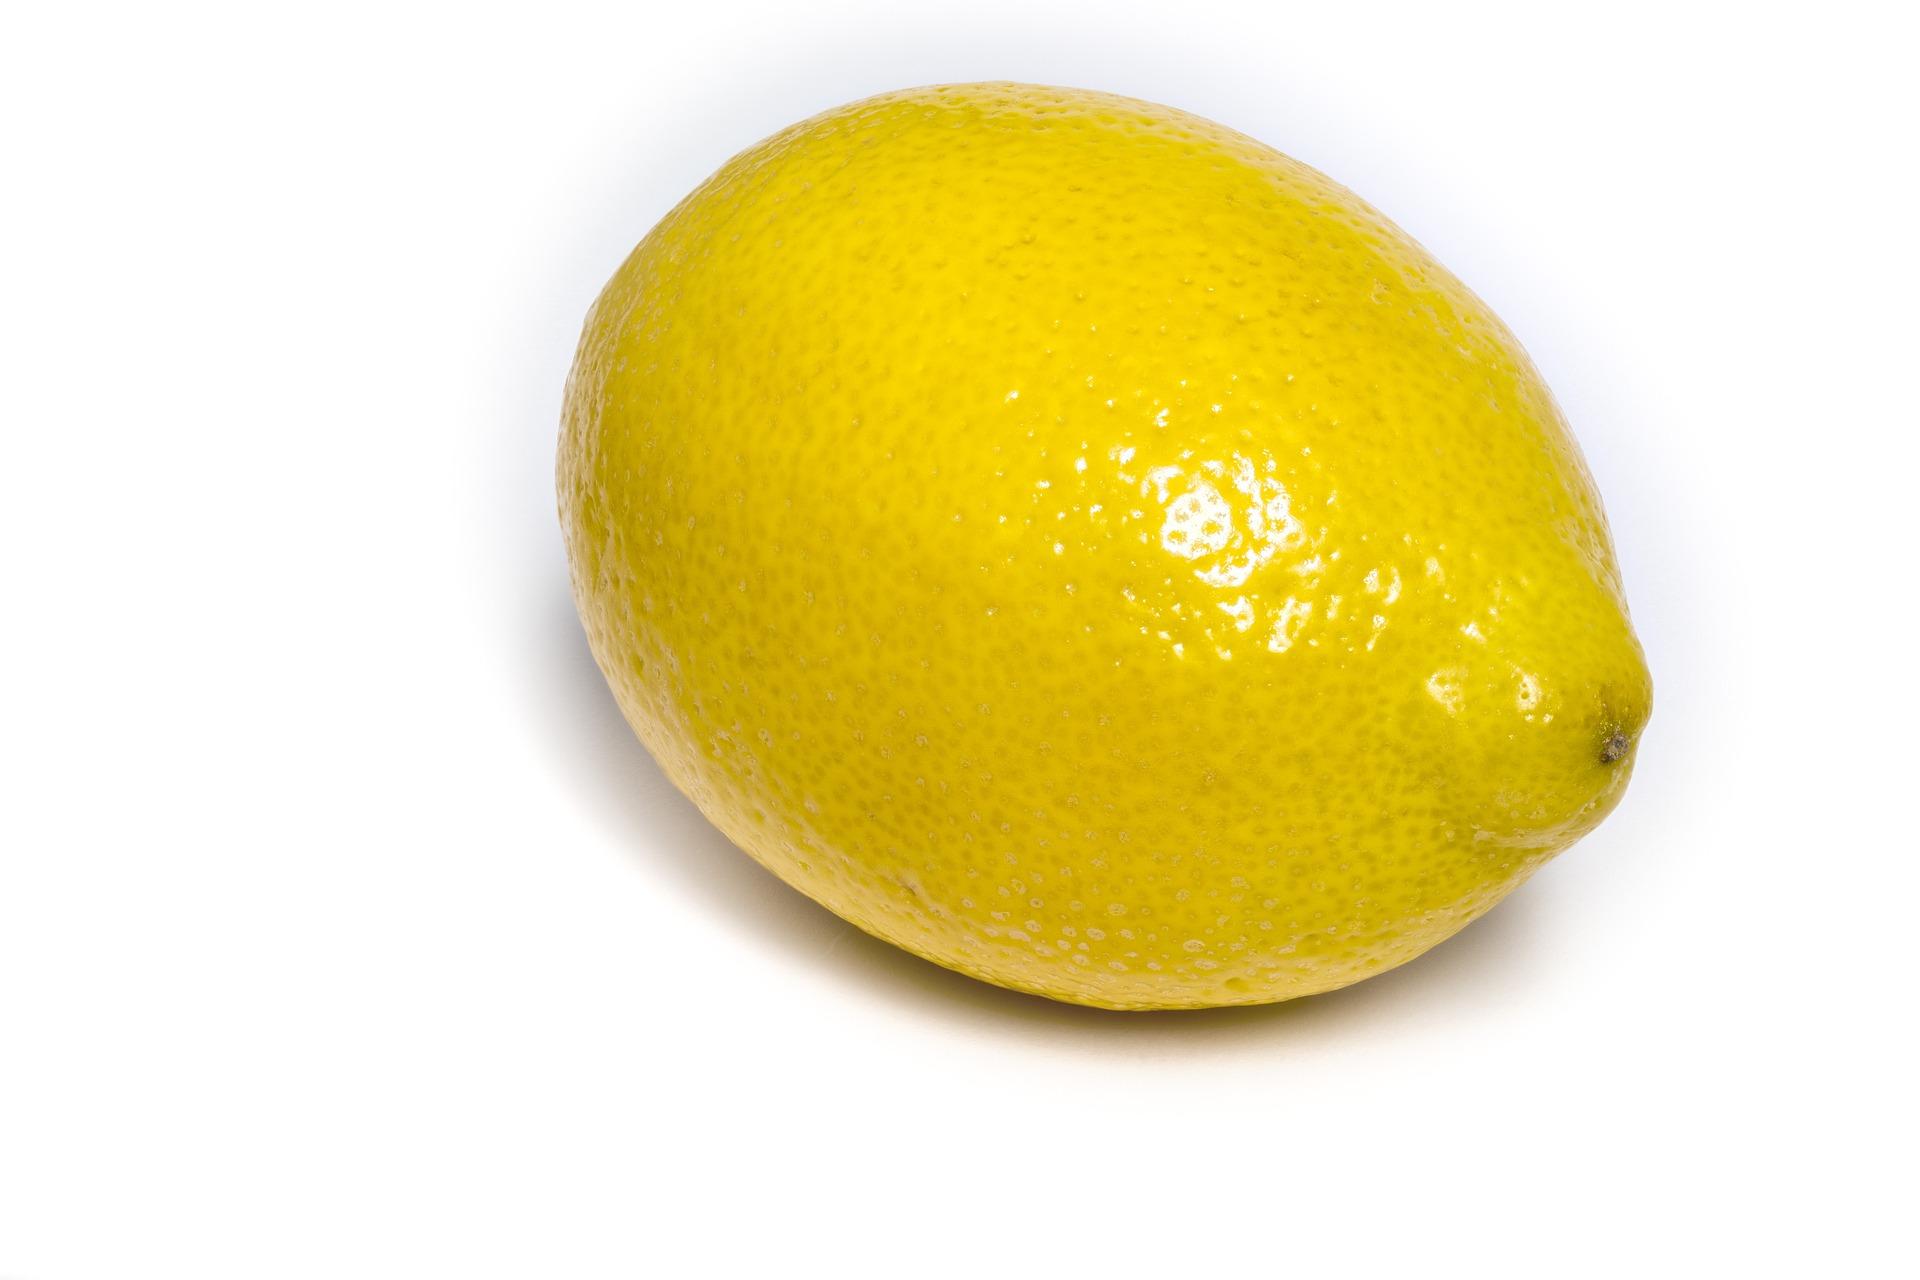 梶井基次郎の檸檬